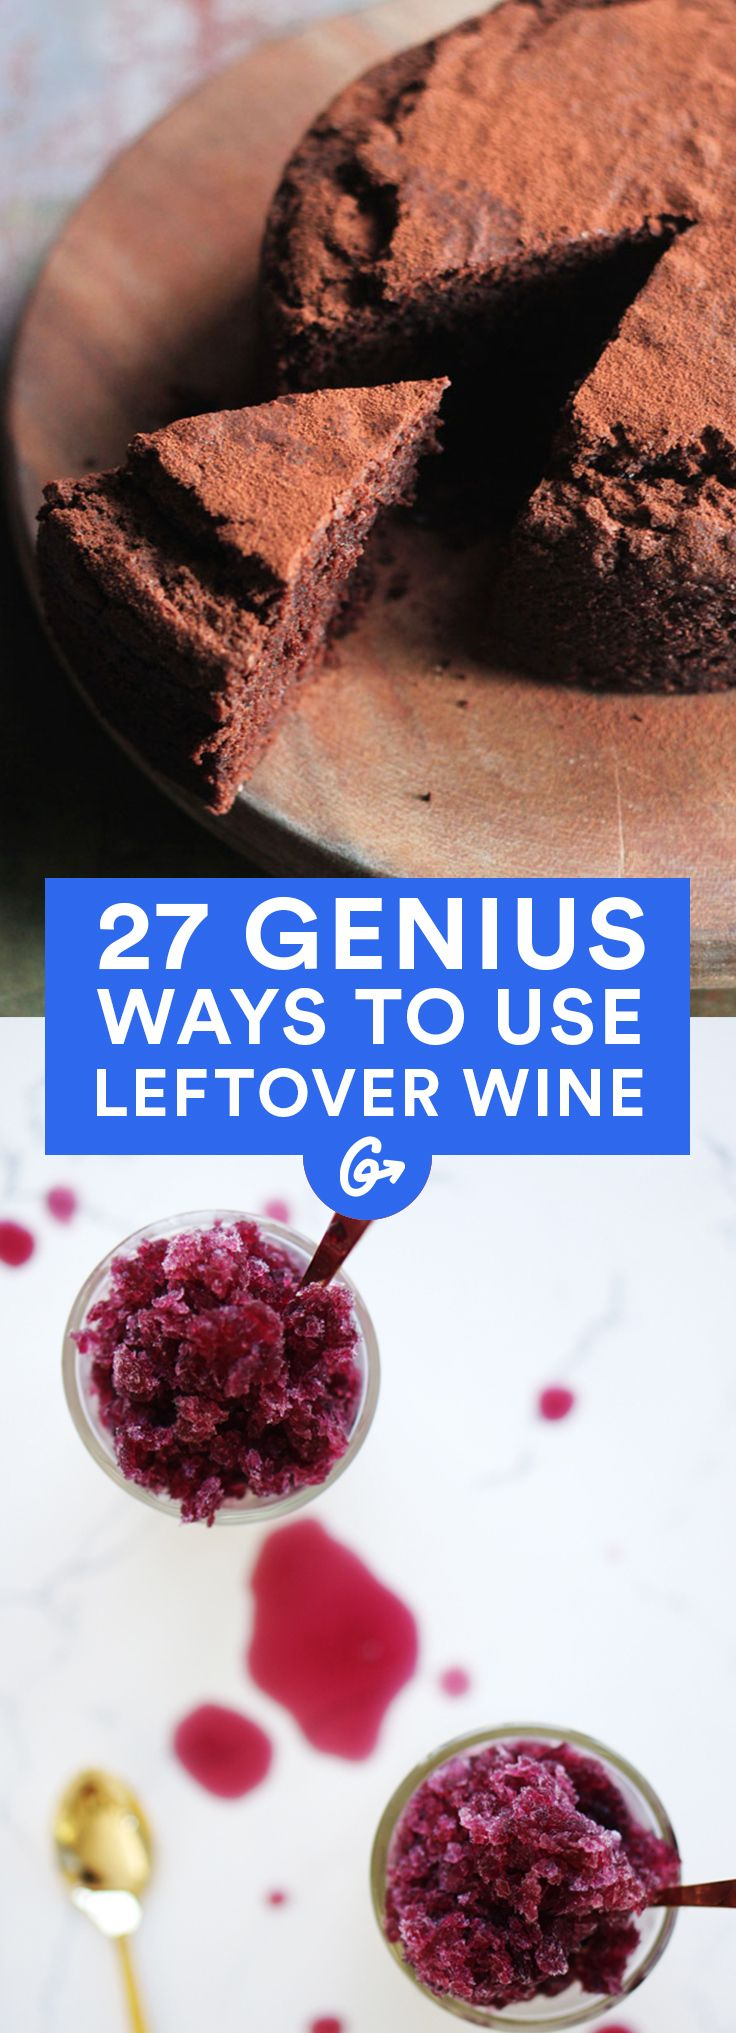 Genius! #DIY #wine #recipes http://greatist.com/eat/ways-use-leftover-wine